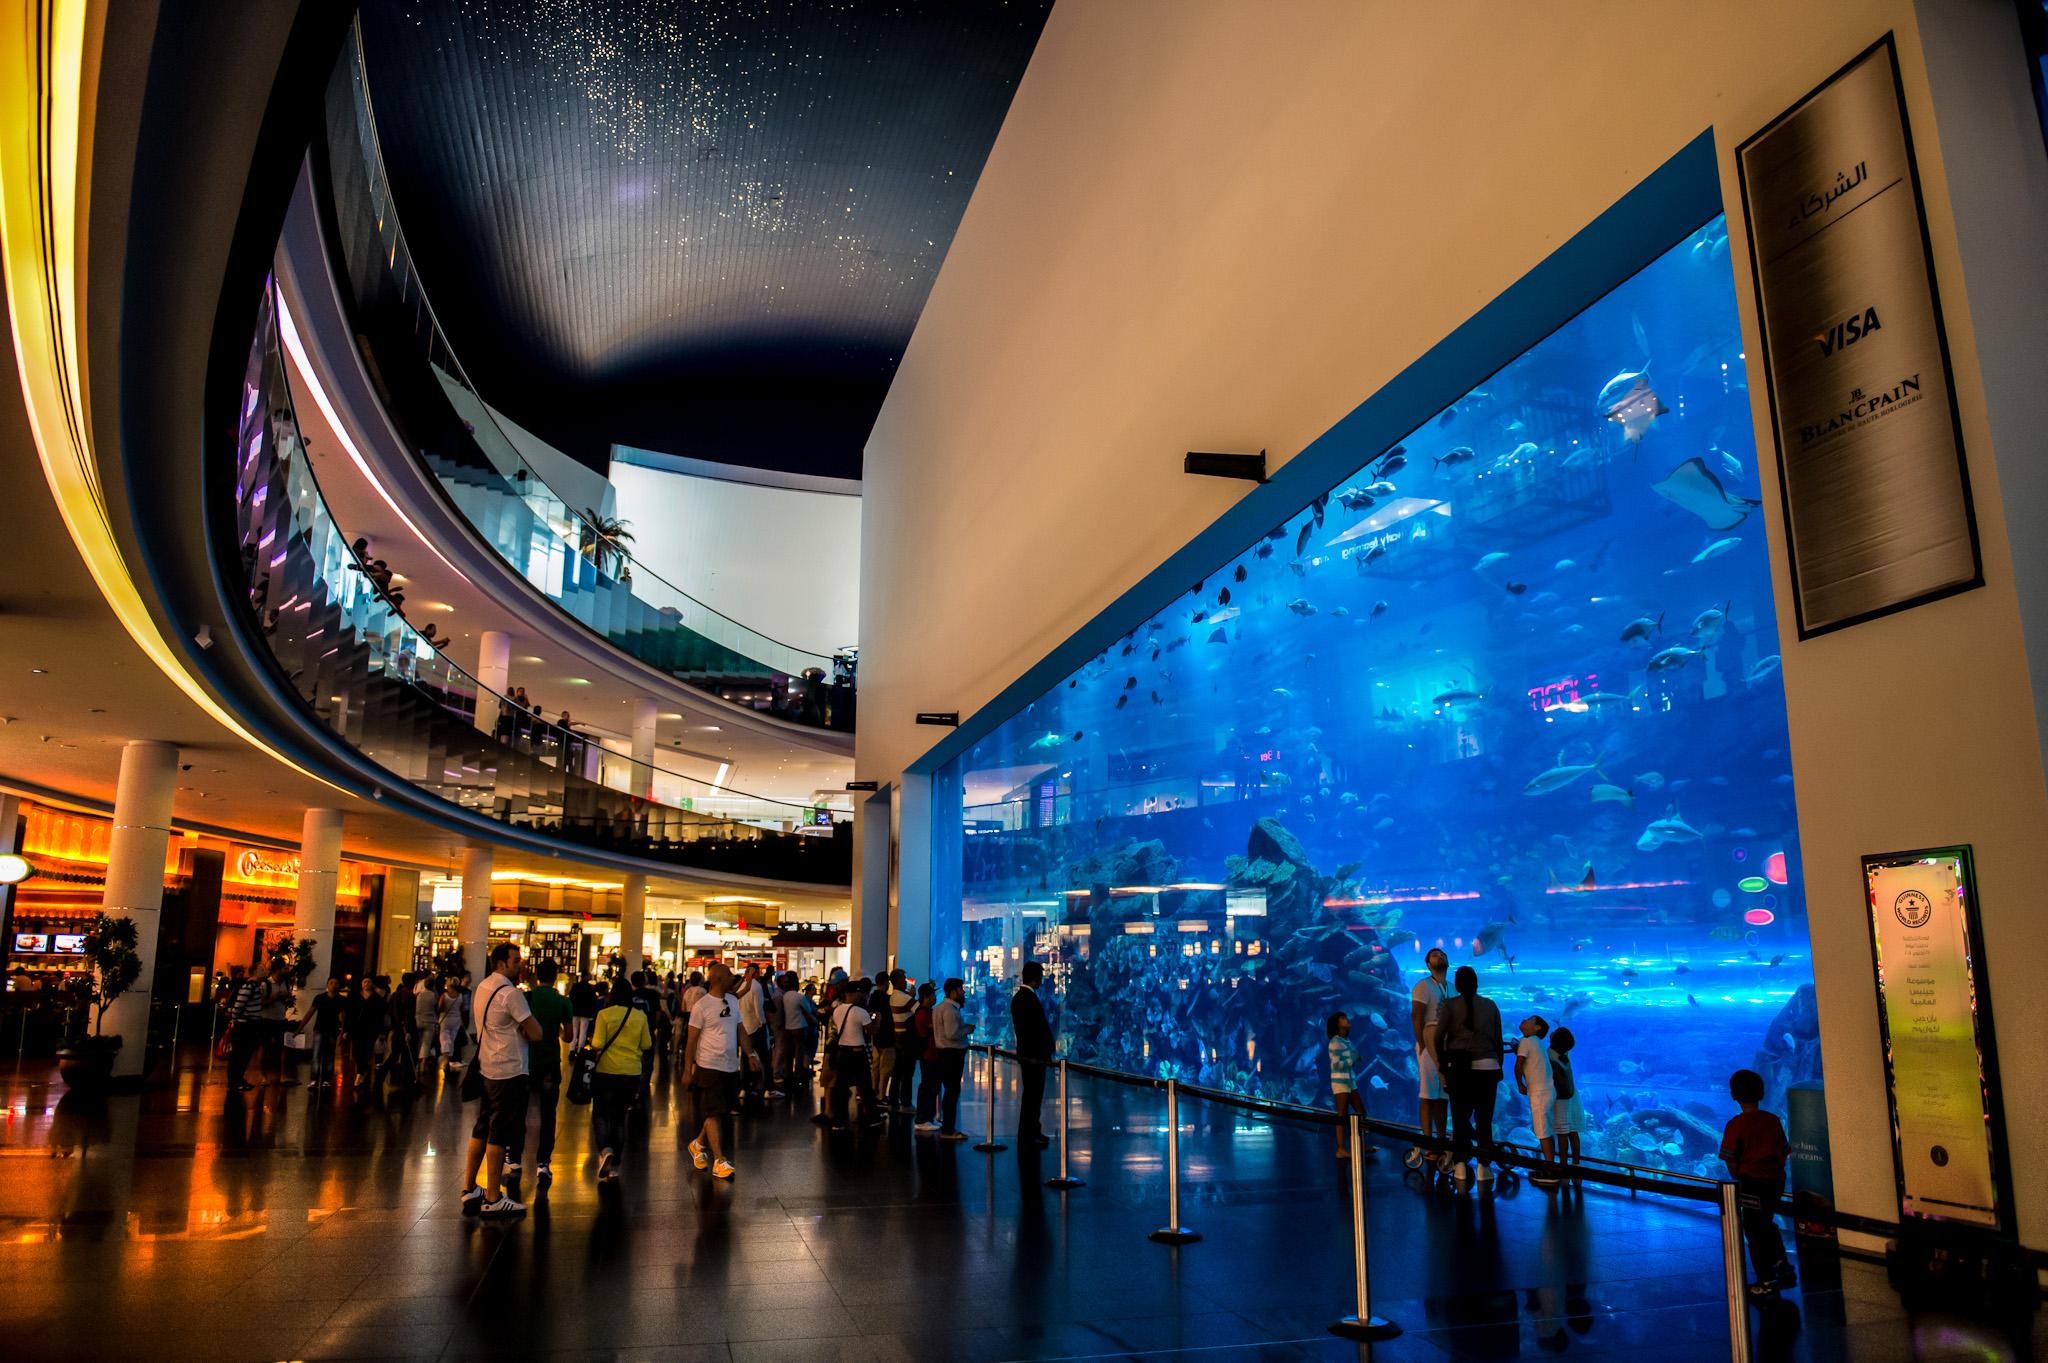 dubai aquarium - إكواريوم دبي (4)